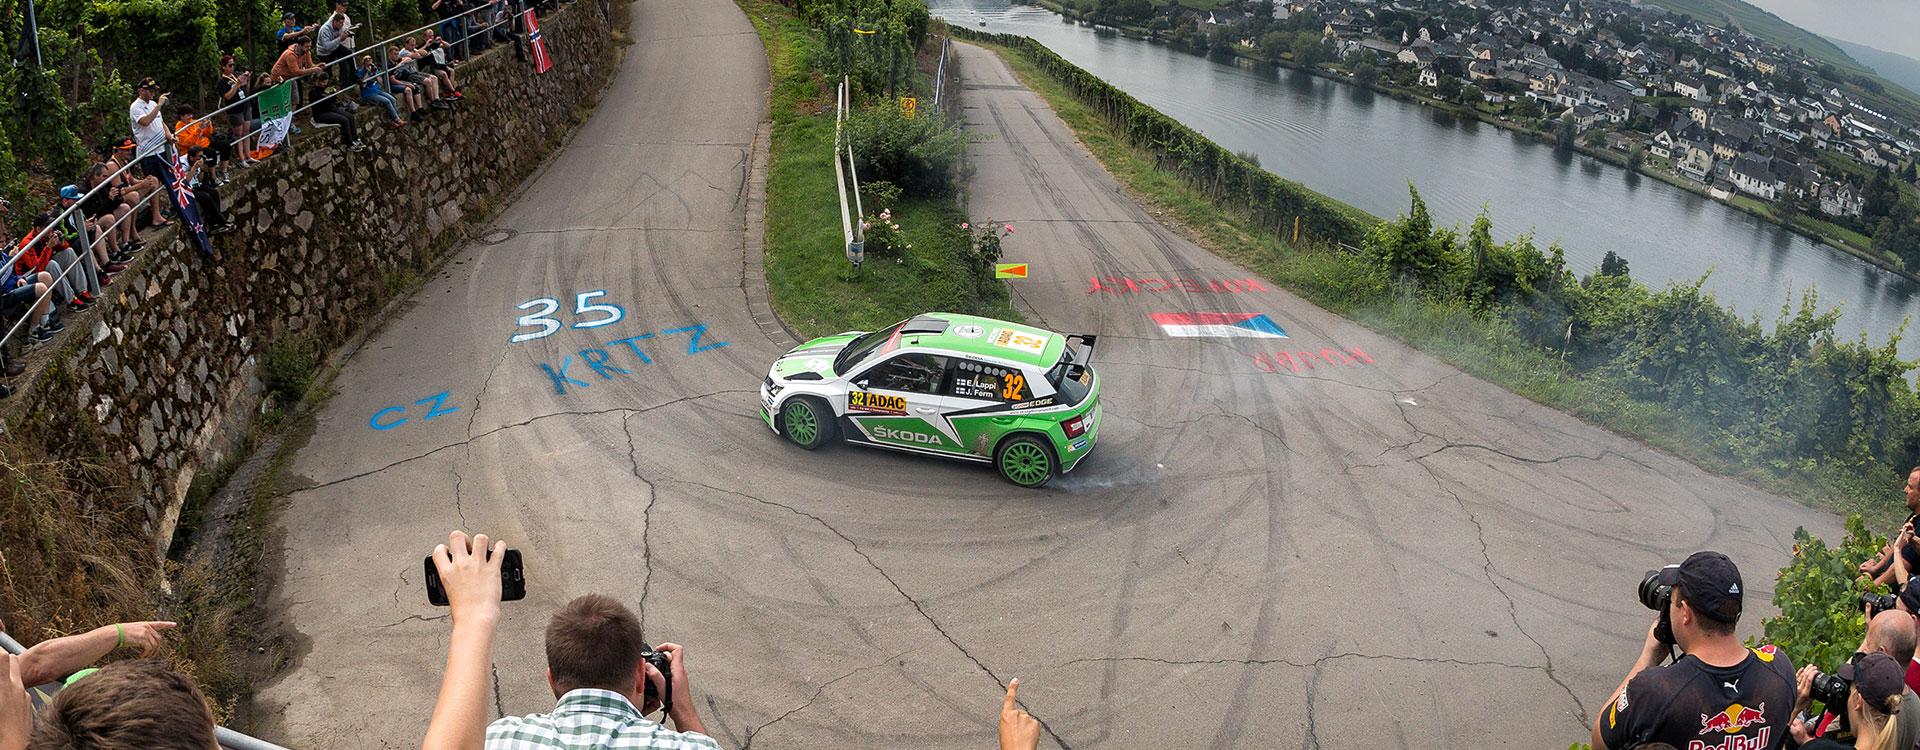 WRC Germany: Good start for ŠKODA among the vineyards